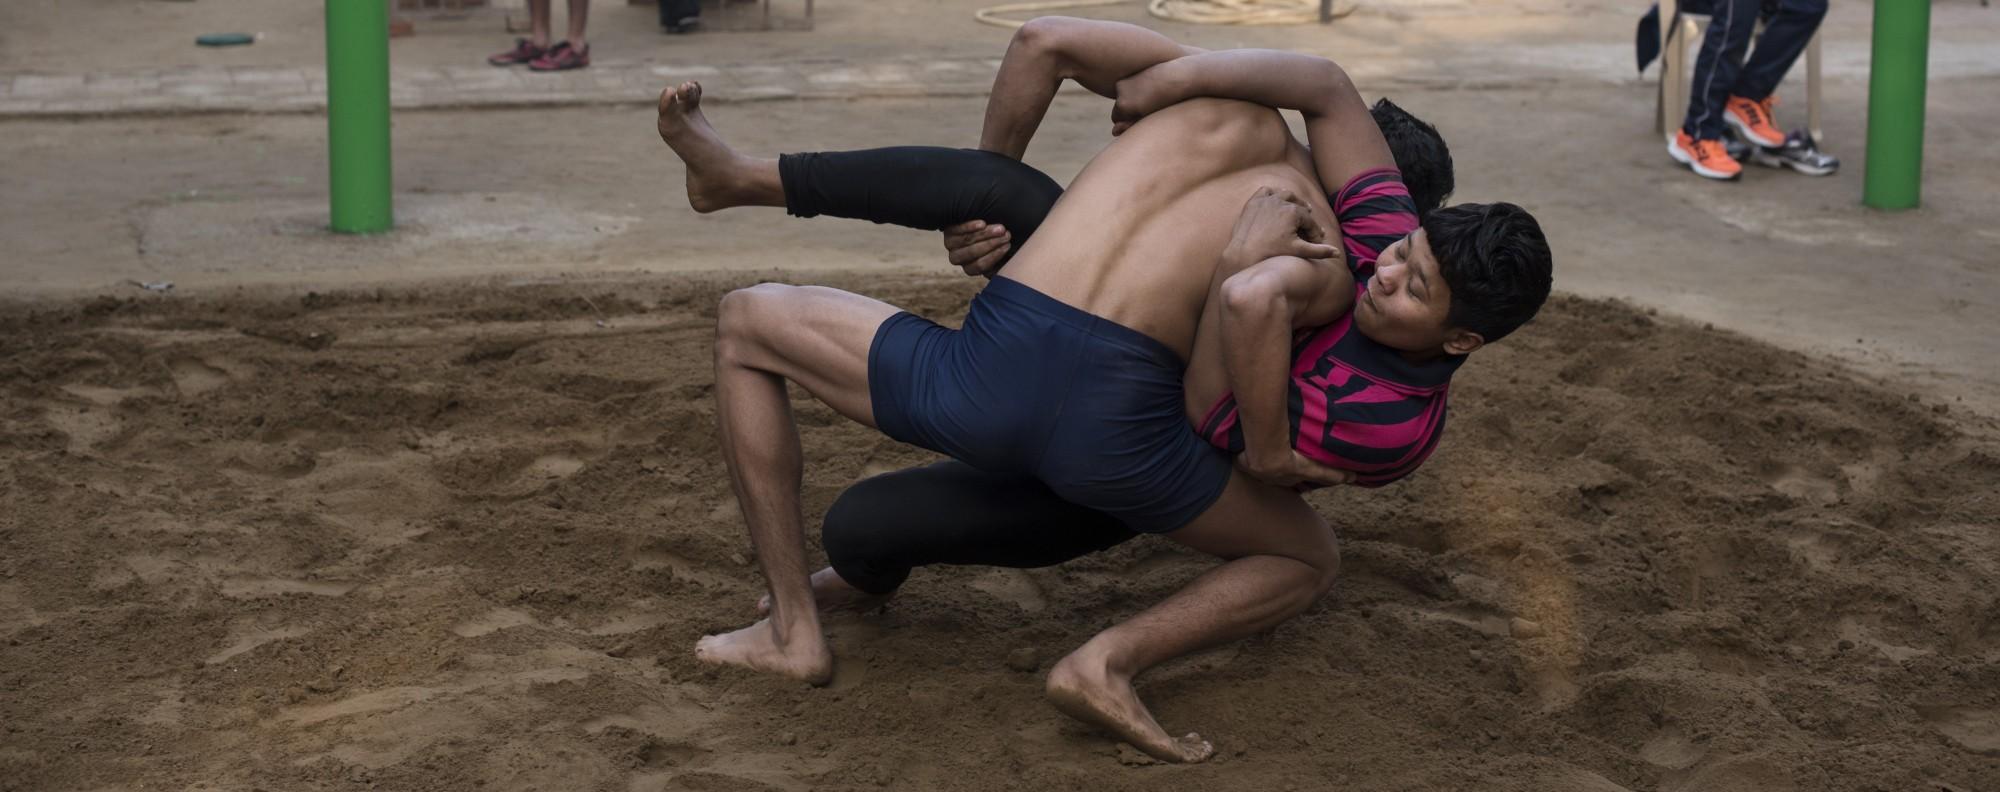 Neha Kumari wrestles a male opponent in an akhara in Delhi.